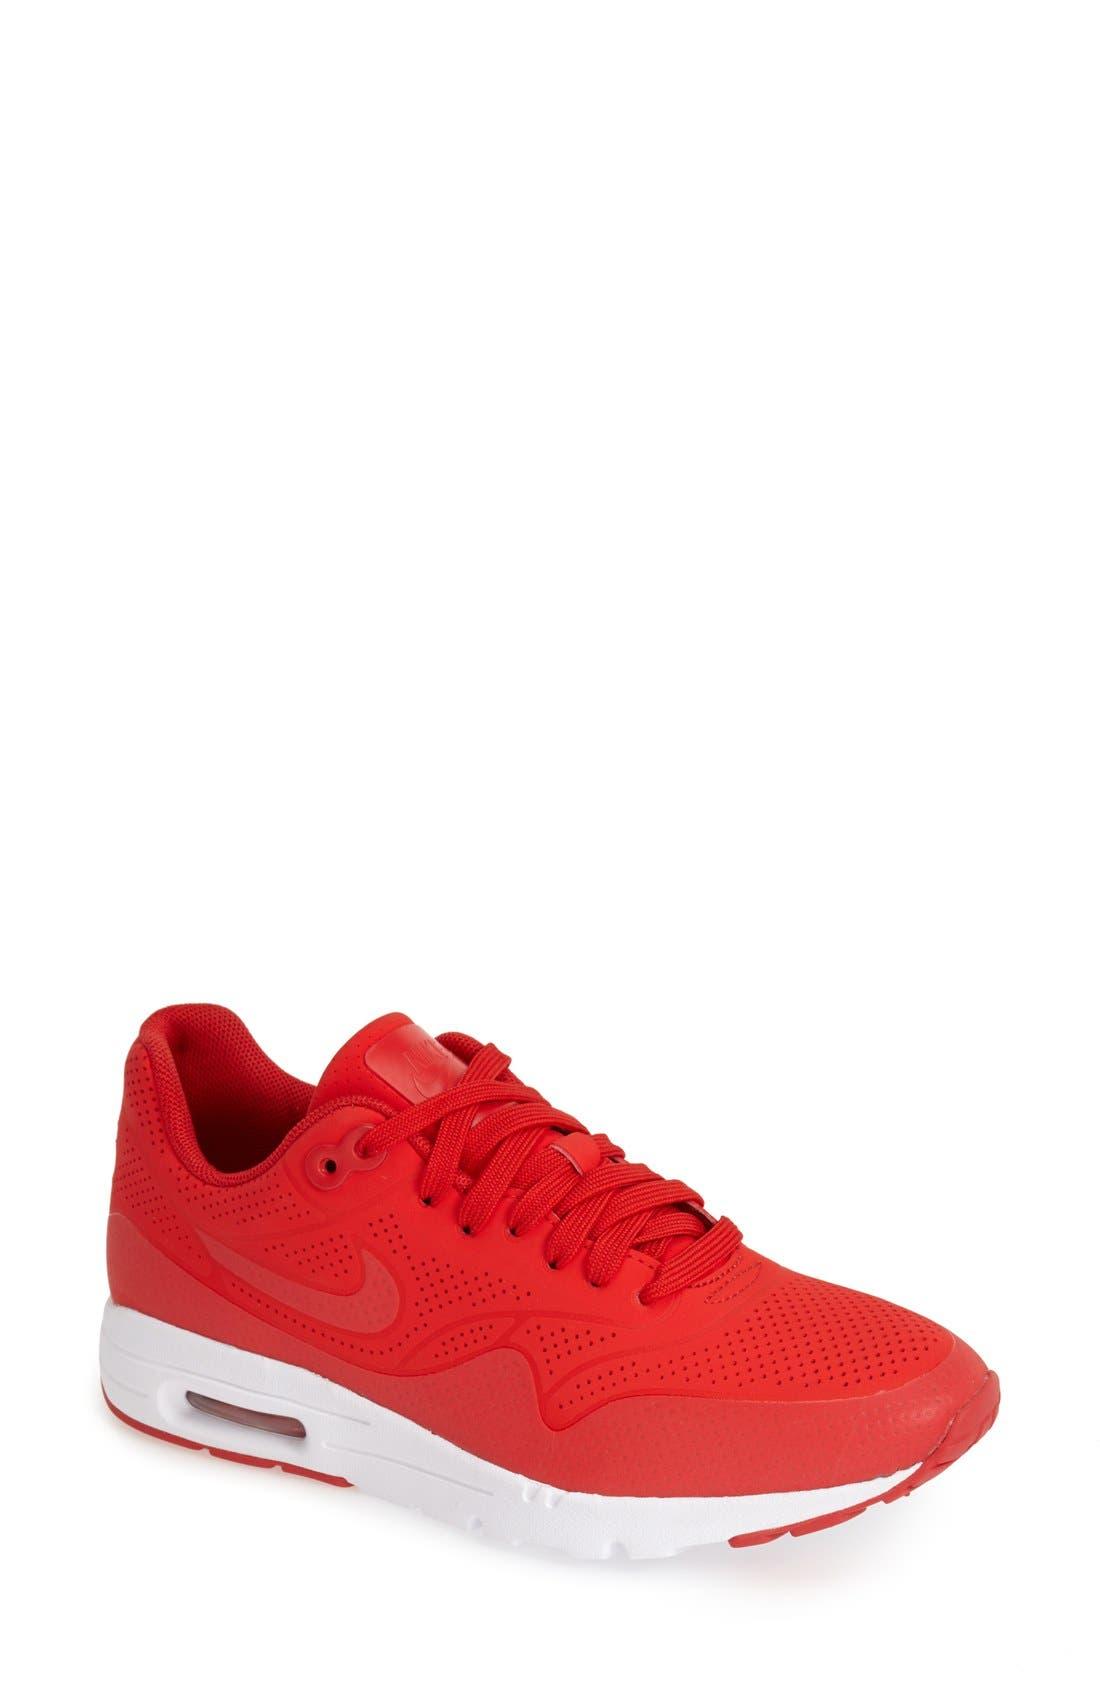 ,                             'Air Max 1 - Ultra Moire' Sneaker,                             Main thumbnail 99, color,                             600